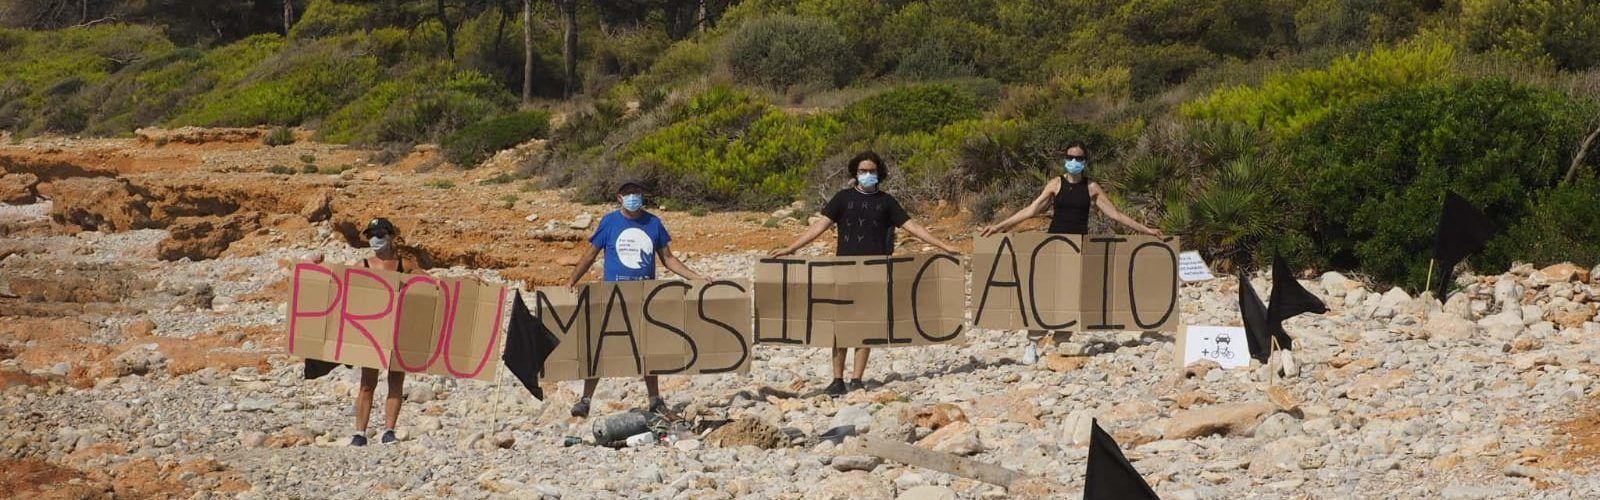 Los ecologistas limpian la Serra d'Irta